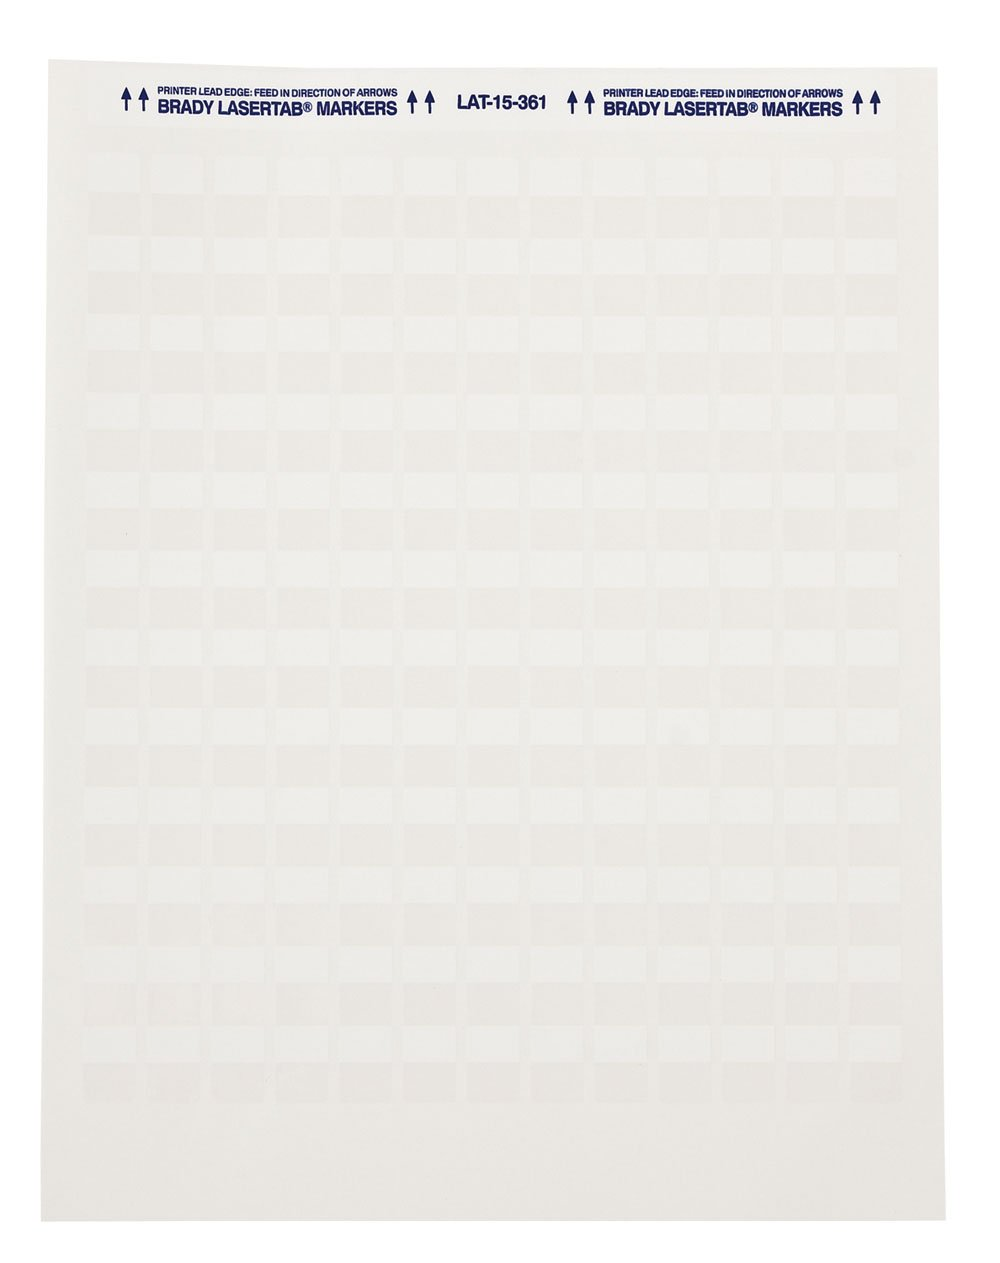 Brady Self-Laminating Laser Printable Polyester Labels (LAT-19-361-1) - Matte Finish, White/Translucent Labels - 1